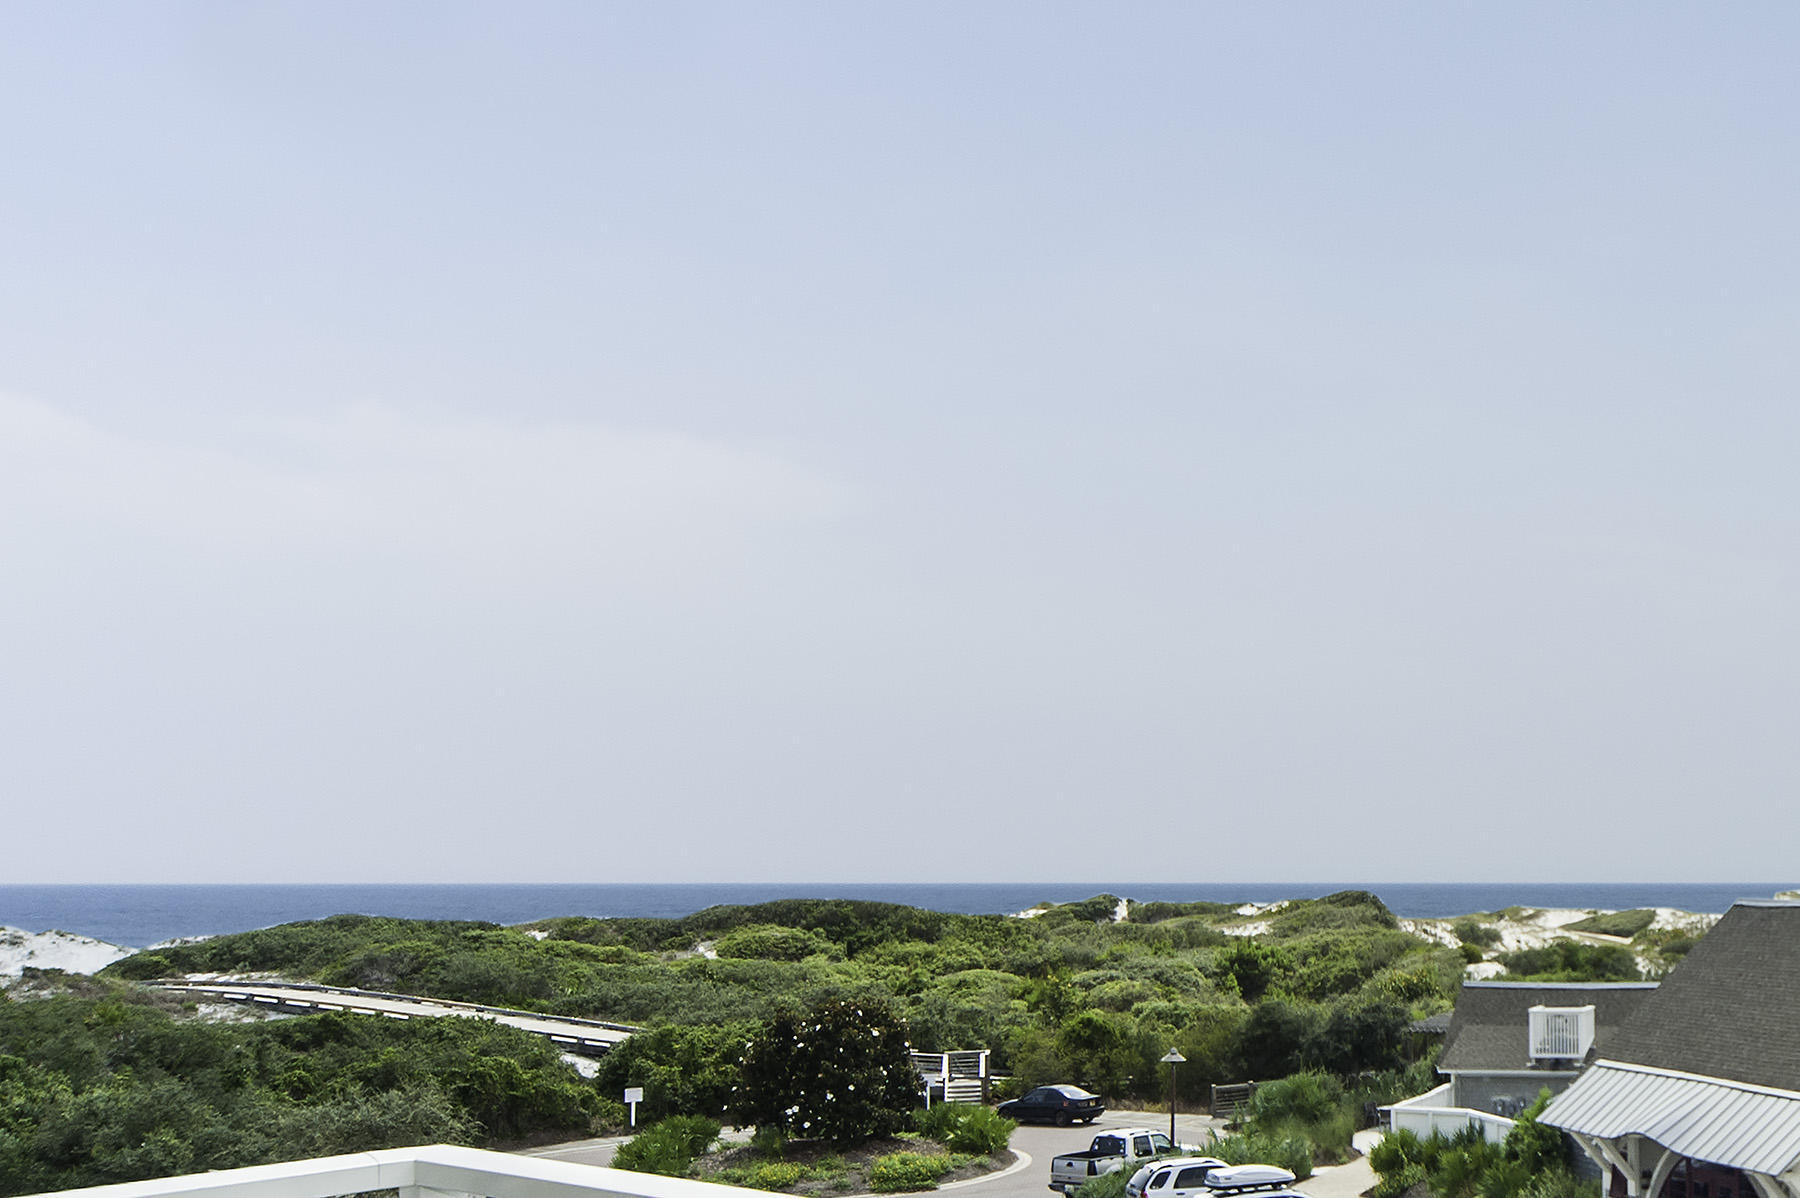 共管物業 為 出售 在 SUNSET FACING GULF VIEW END UNIT 99 Compass Point Way 302 Watersound, 佛羅里達州 32461 美國